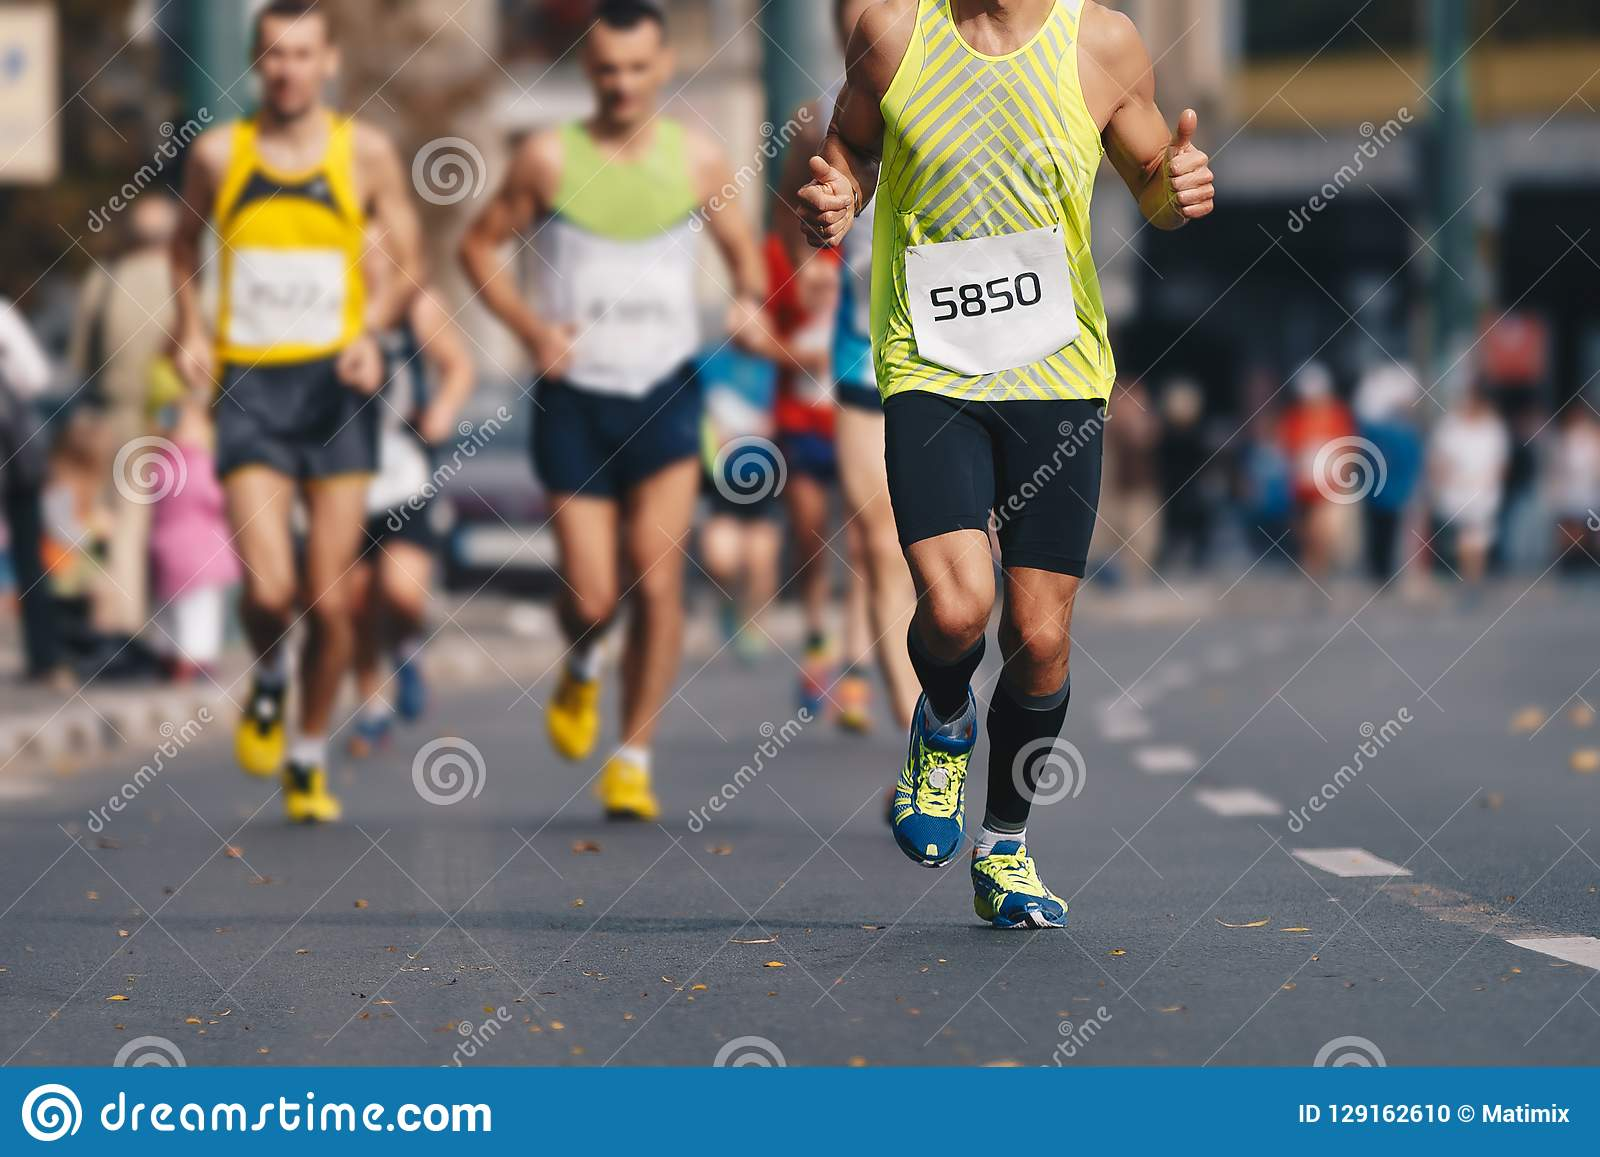 Autumn fall urban marathon run. Group of active people running marathon race in the city downtown